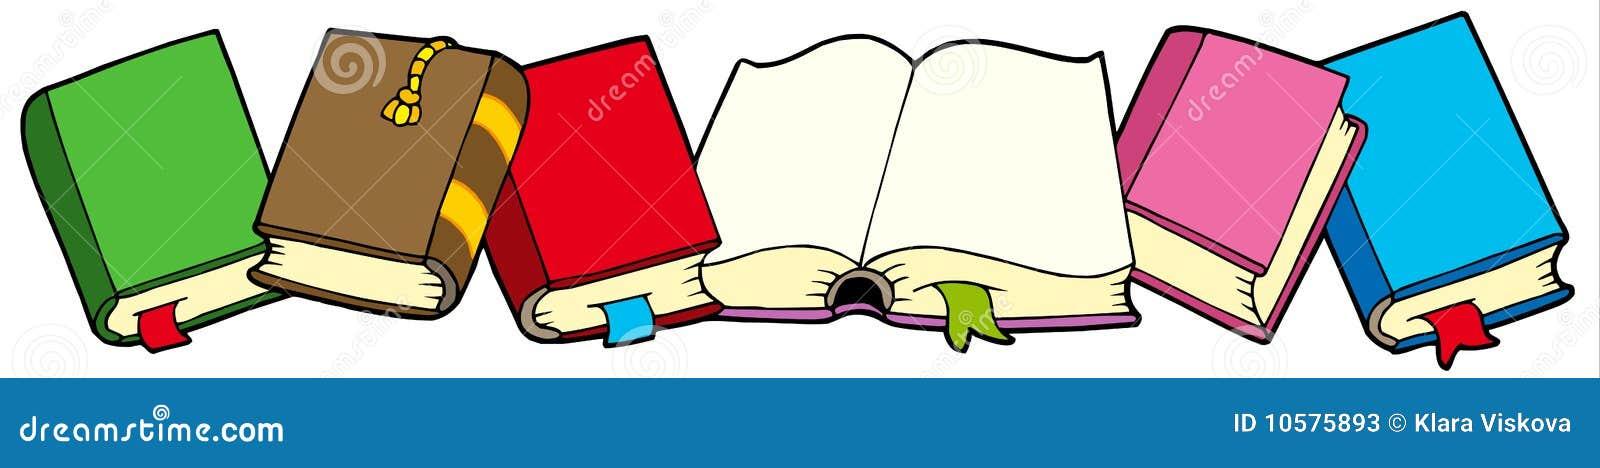 Line Art Book : Line of books stock vector illustration learn book